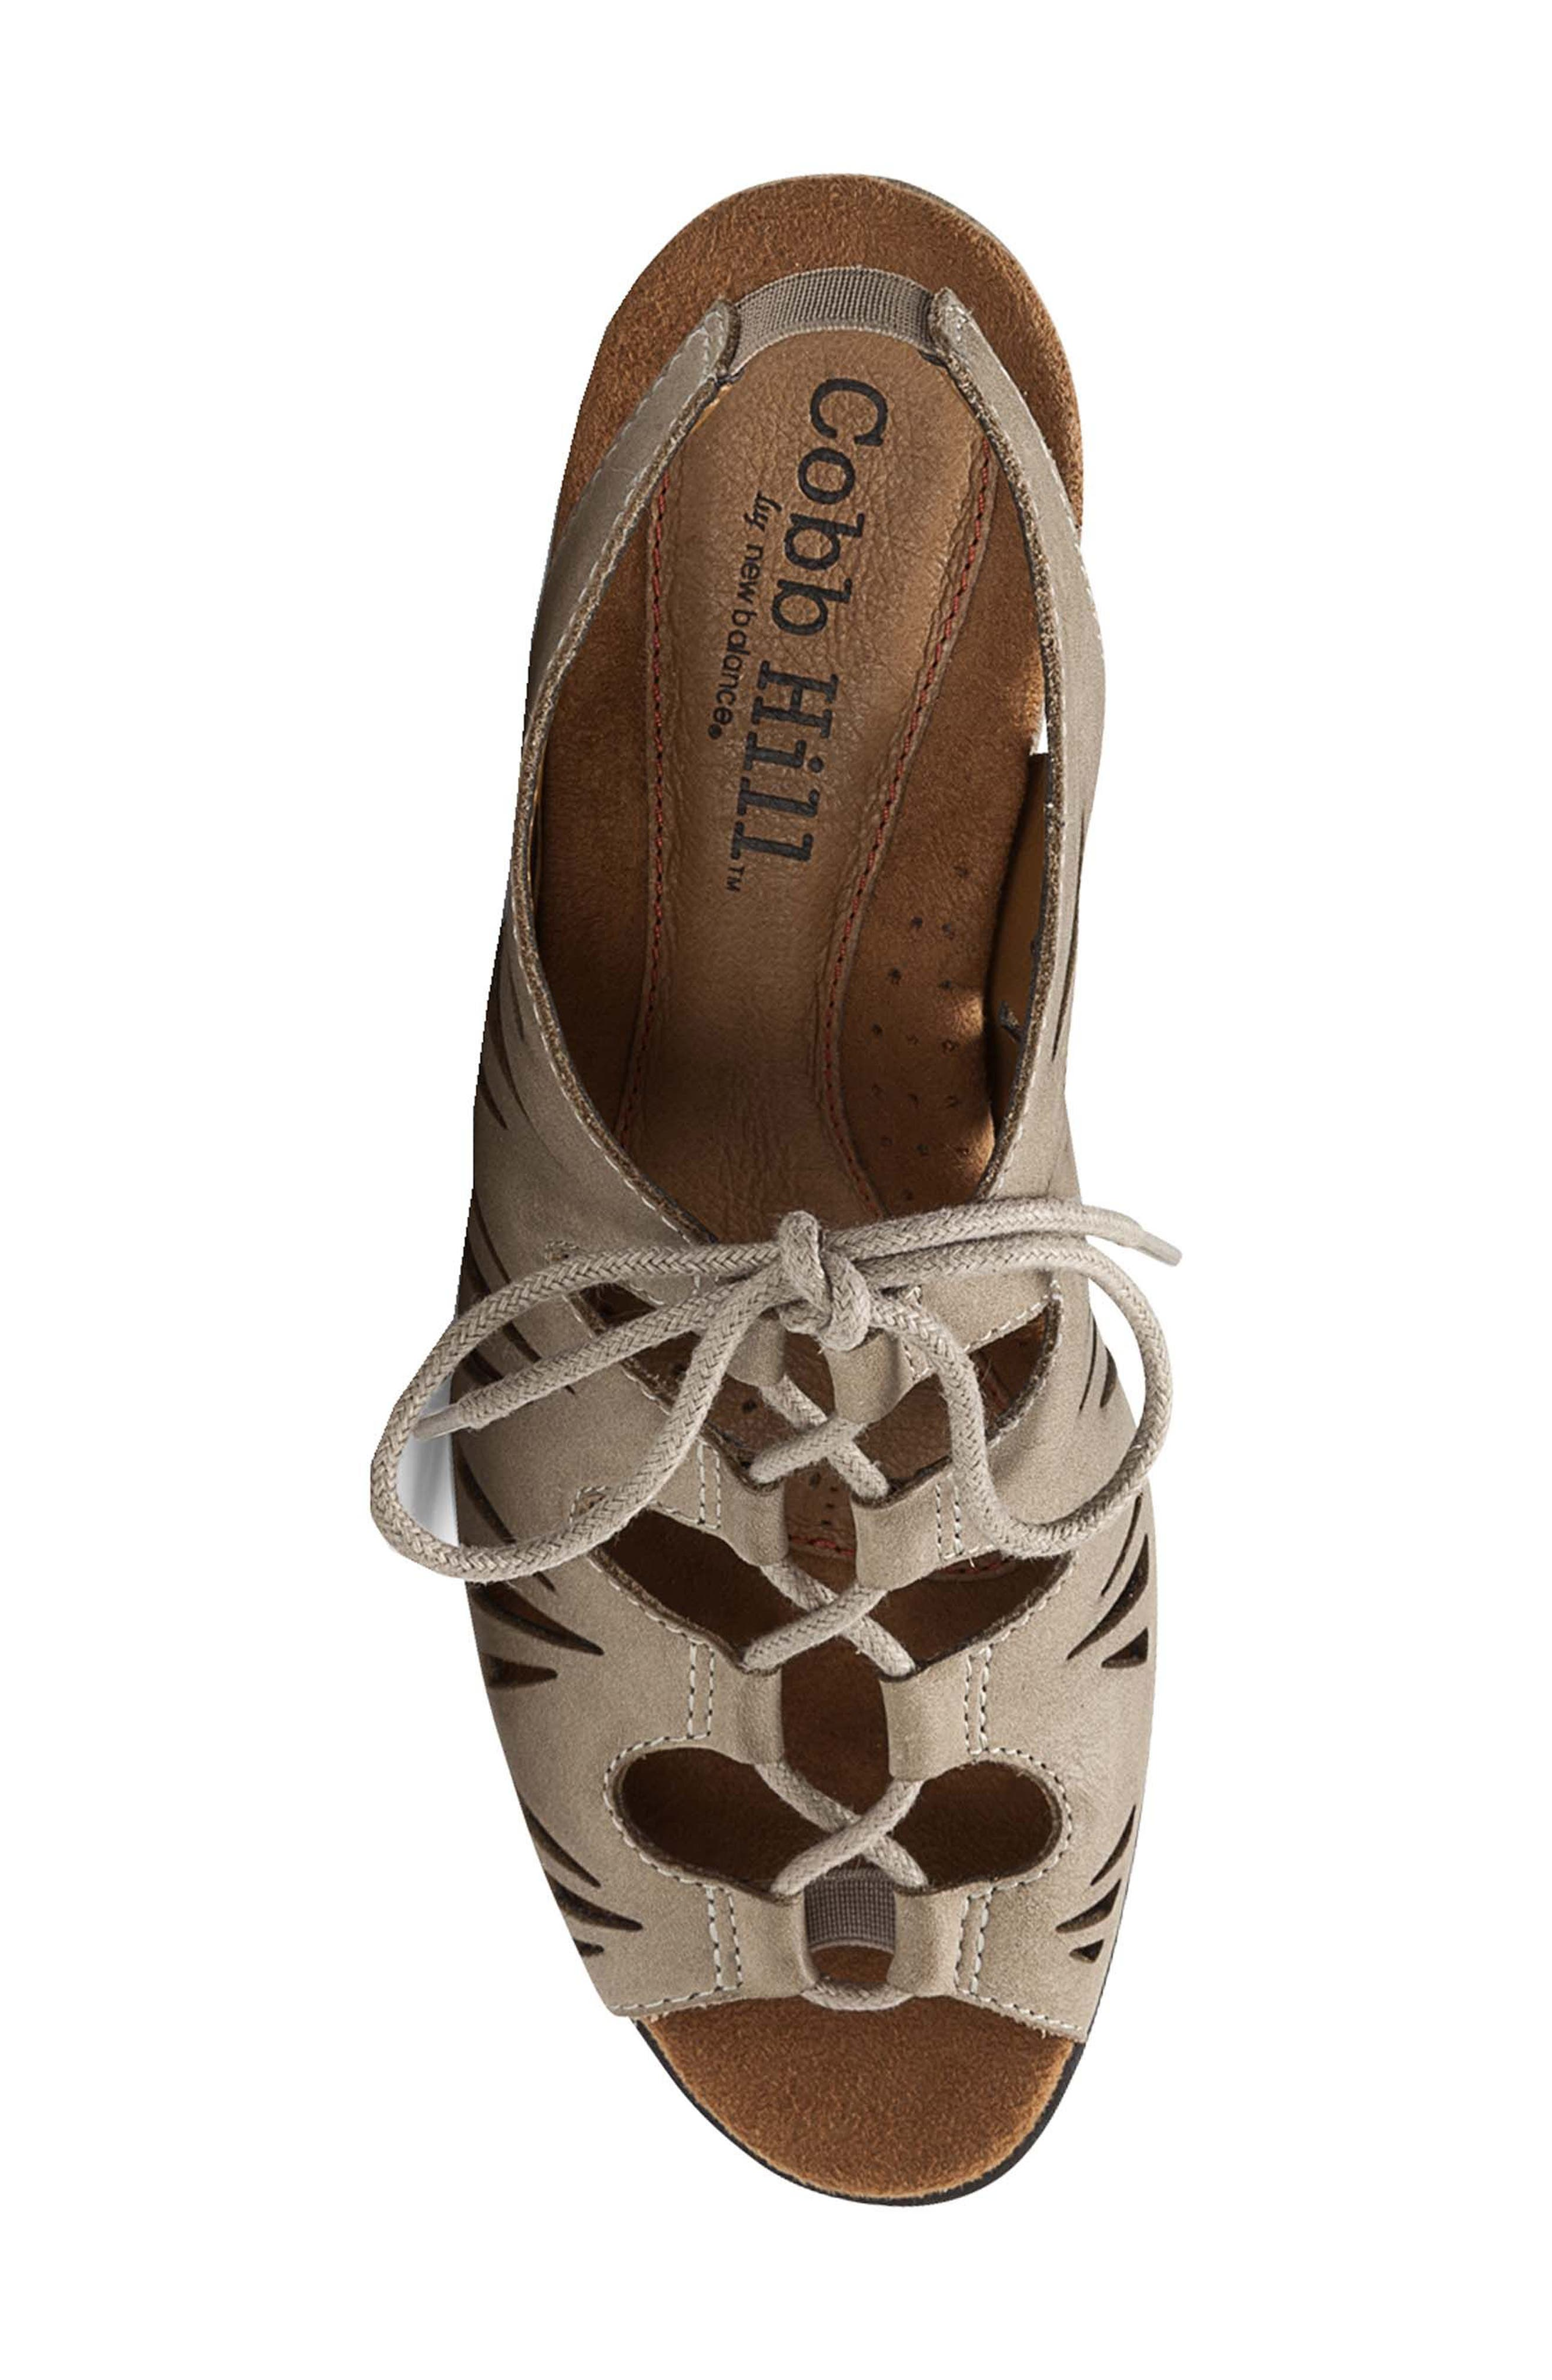 Cobb Hill 'Sasha' Caged Leather Peep Toe Sandal,                             Alternate thumbnail 4, color,                             KHAKI NUBUCK LEATHER